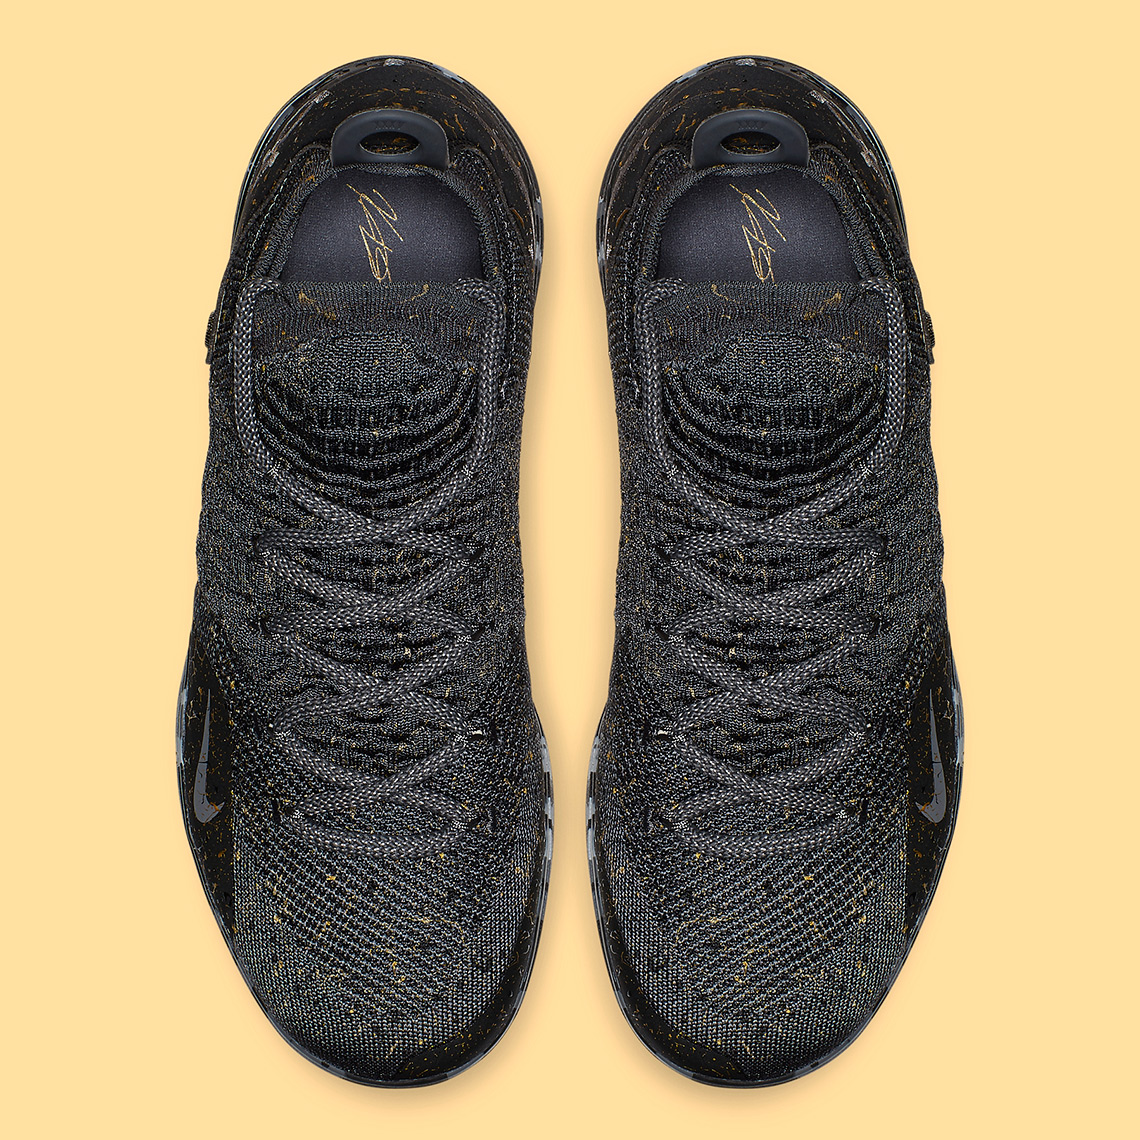 ec5b25150310 Nike KD 11 AO2604-901 Championship Release Date